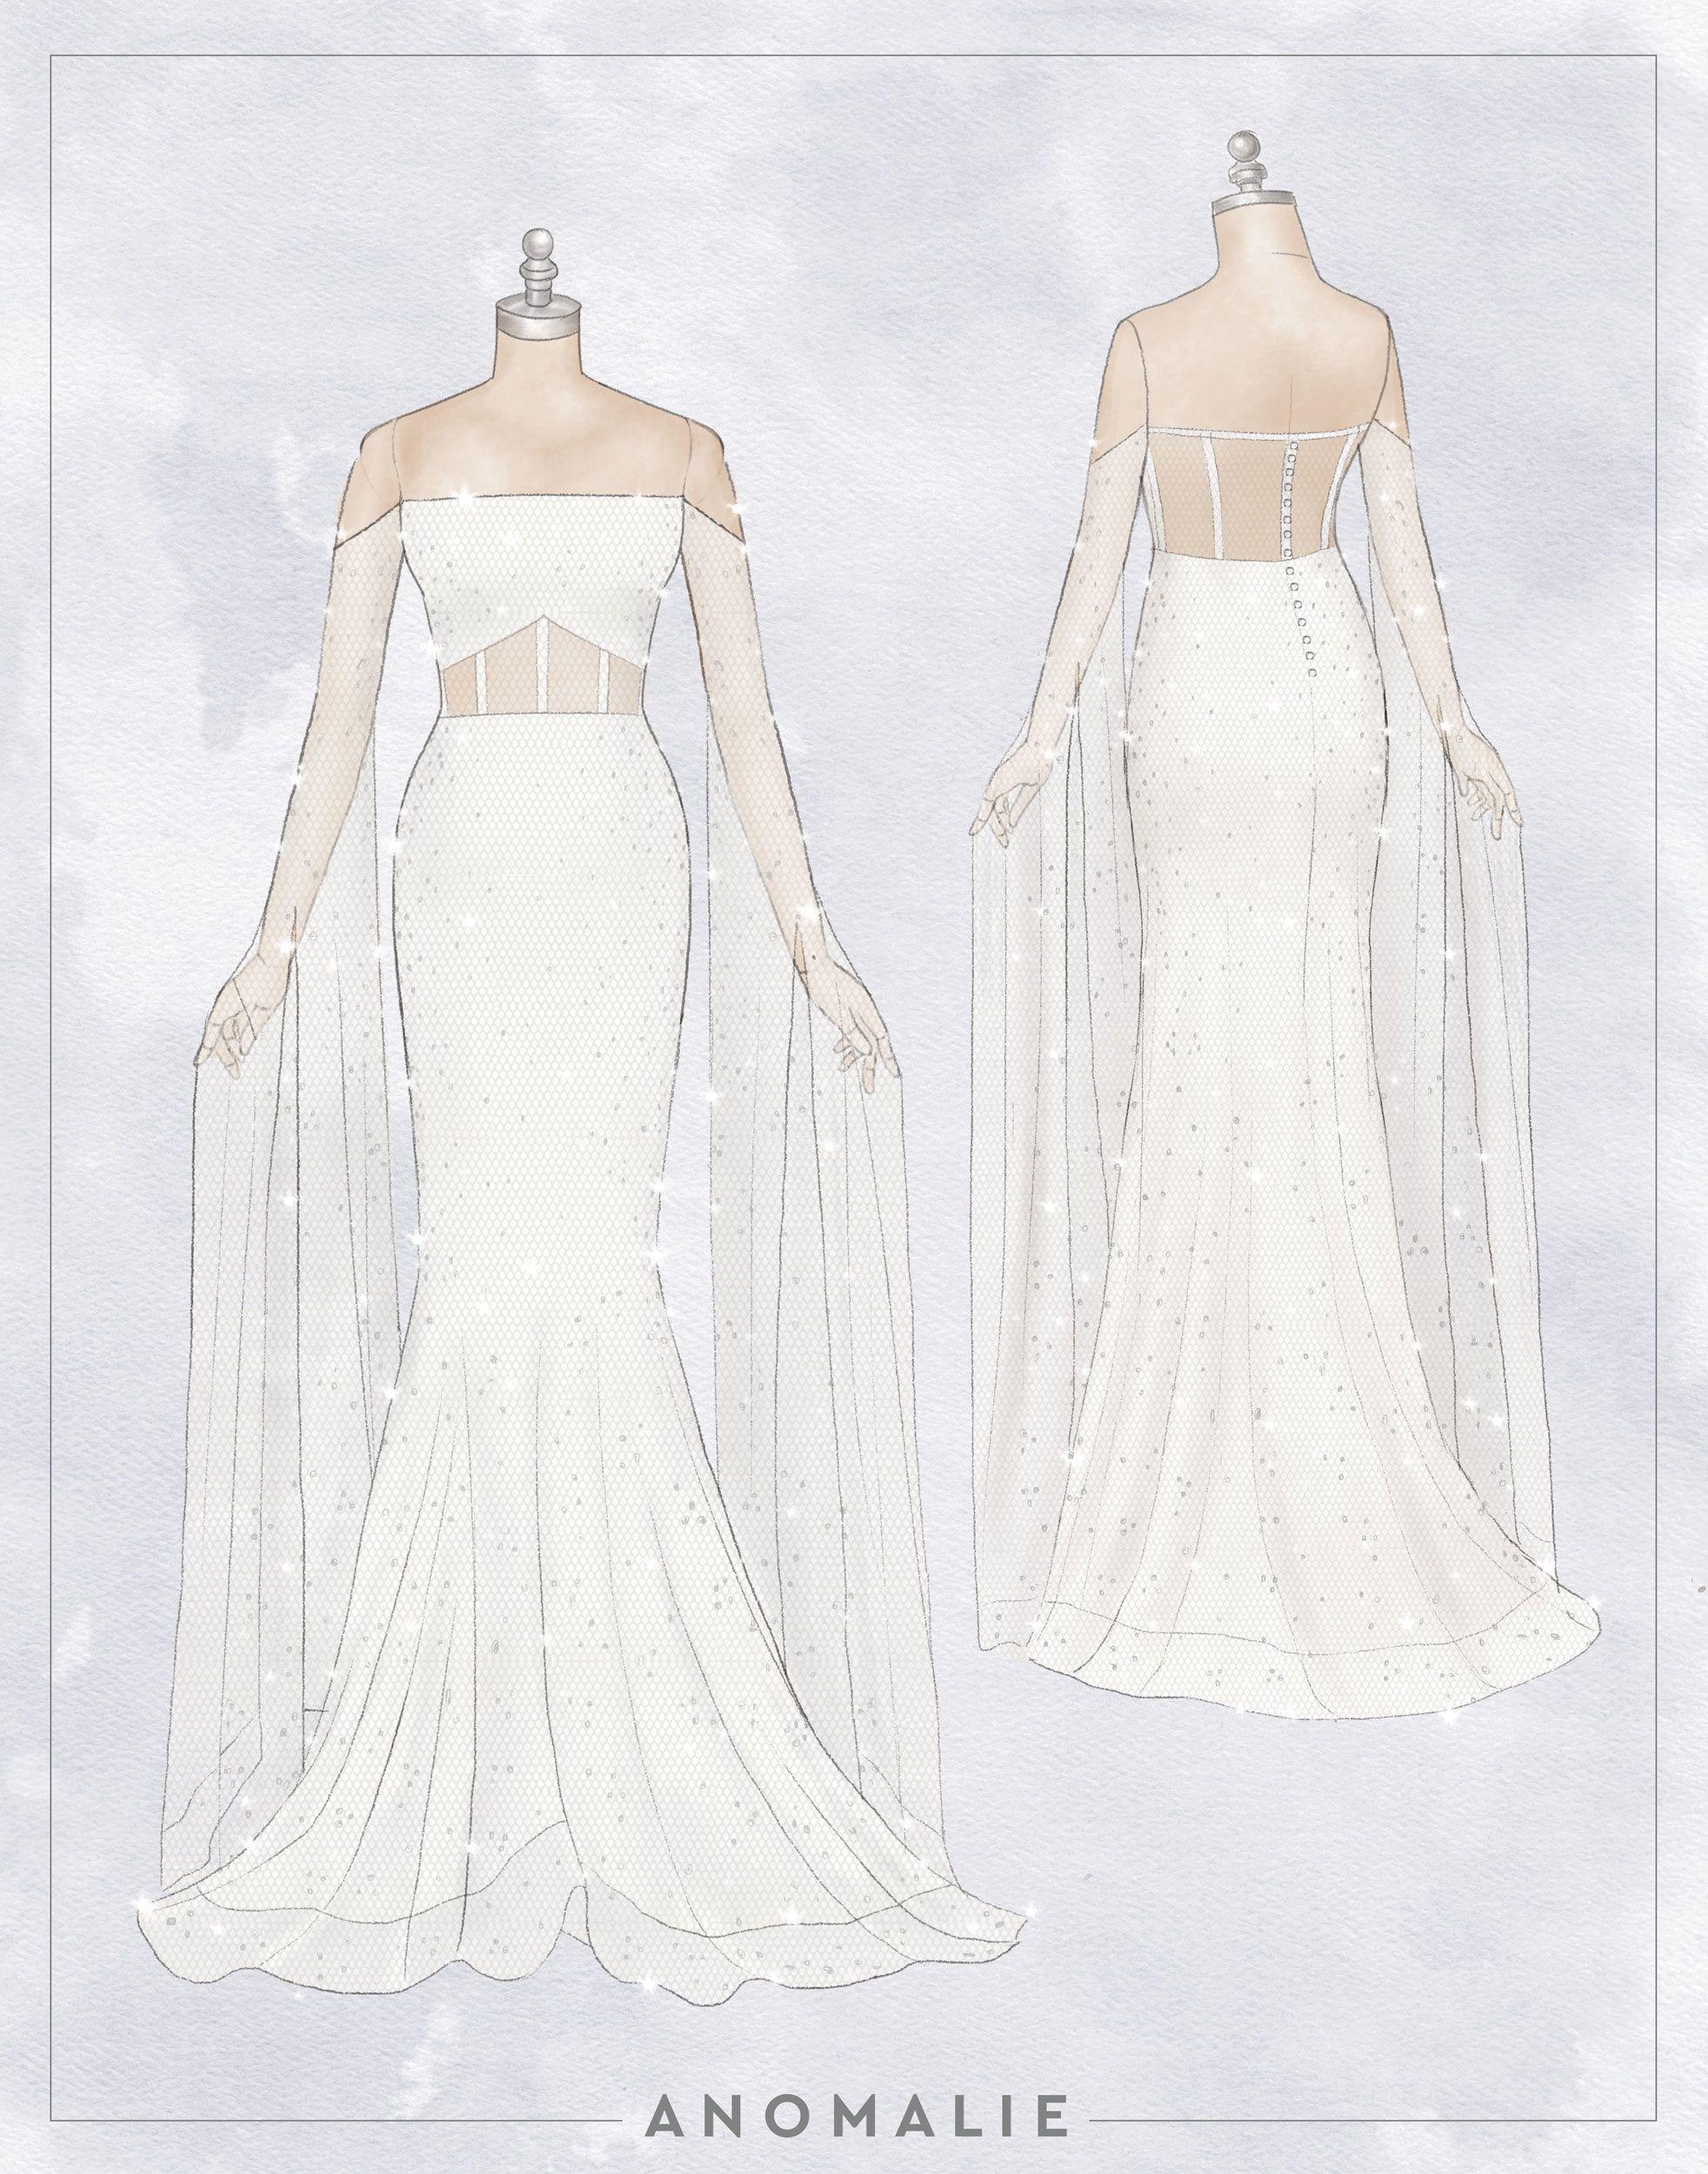 Anomalie Custom Sketch Of Floor Length Bell Sleeves Wedding Dress Fashion Illustration Dresses Fashion Sketches Dresses Fashion Drawing Dresses